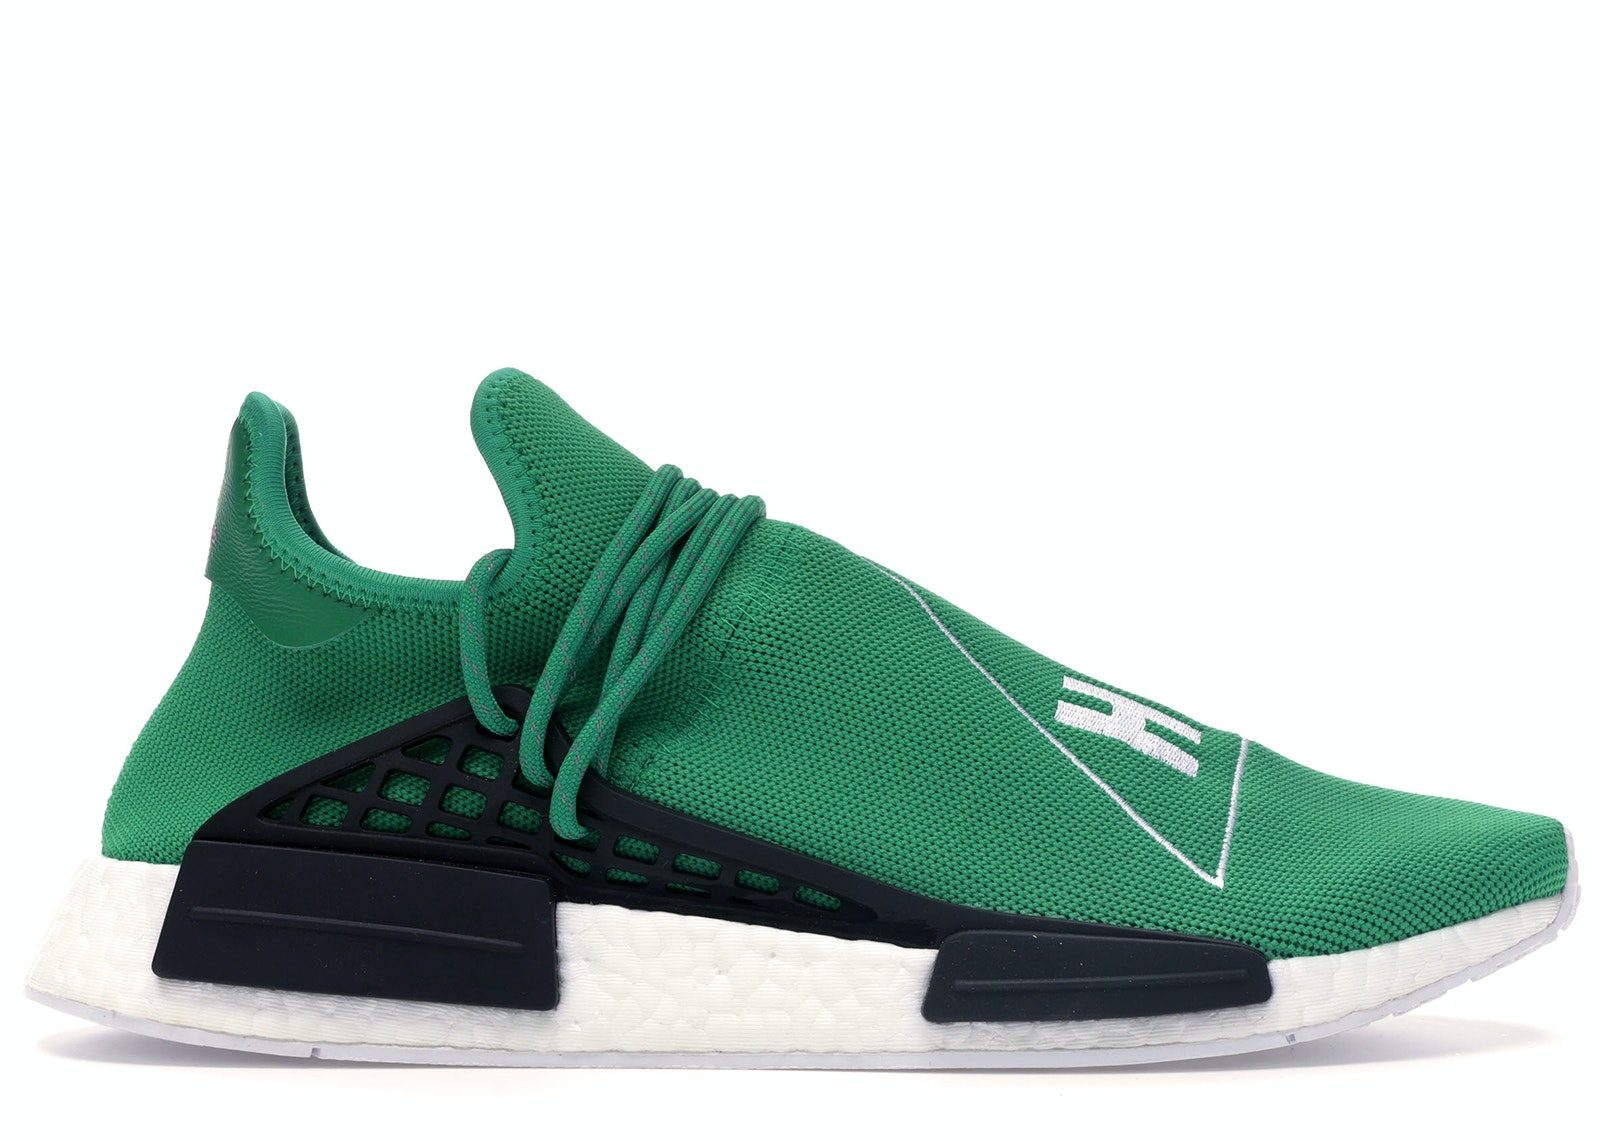 adidas NMD R1 Pharrell HU Green